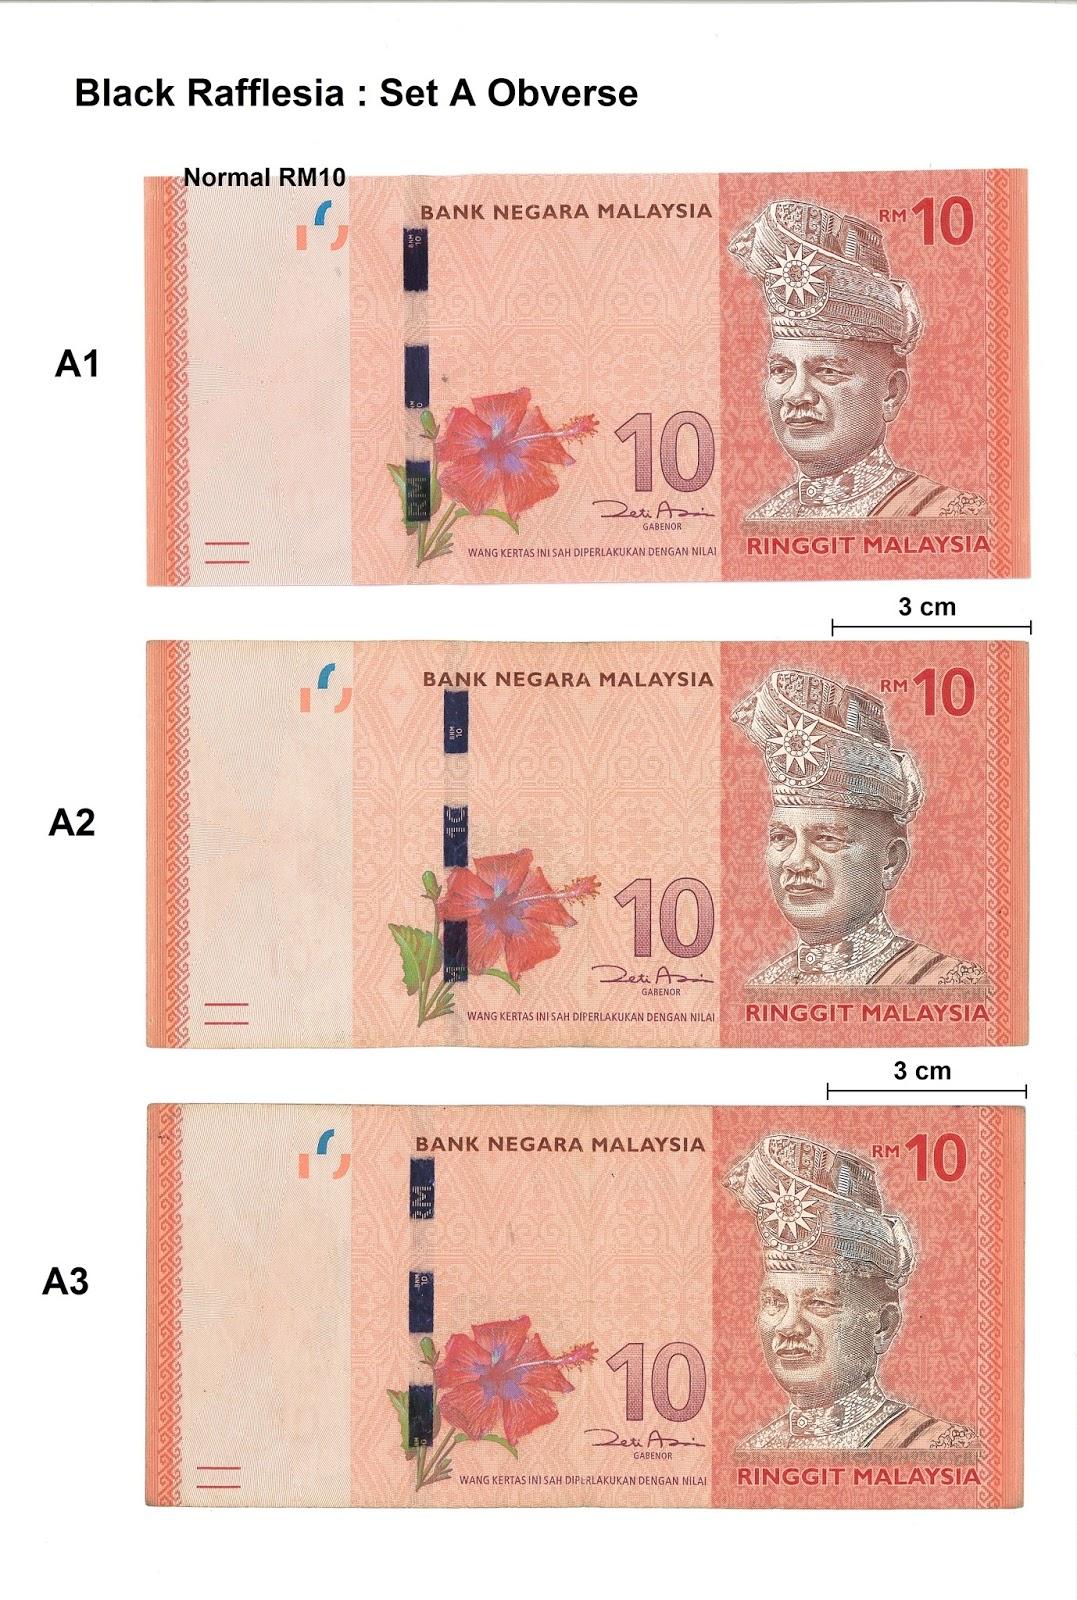 Malaysia 12th Series RM10 Black Rafflesia - Set A Obverse